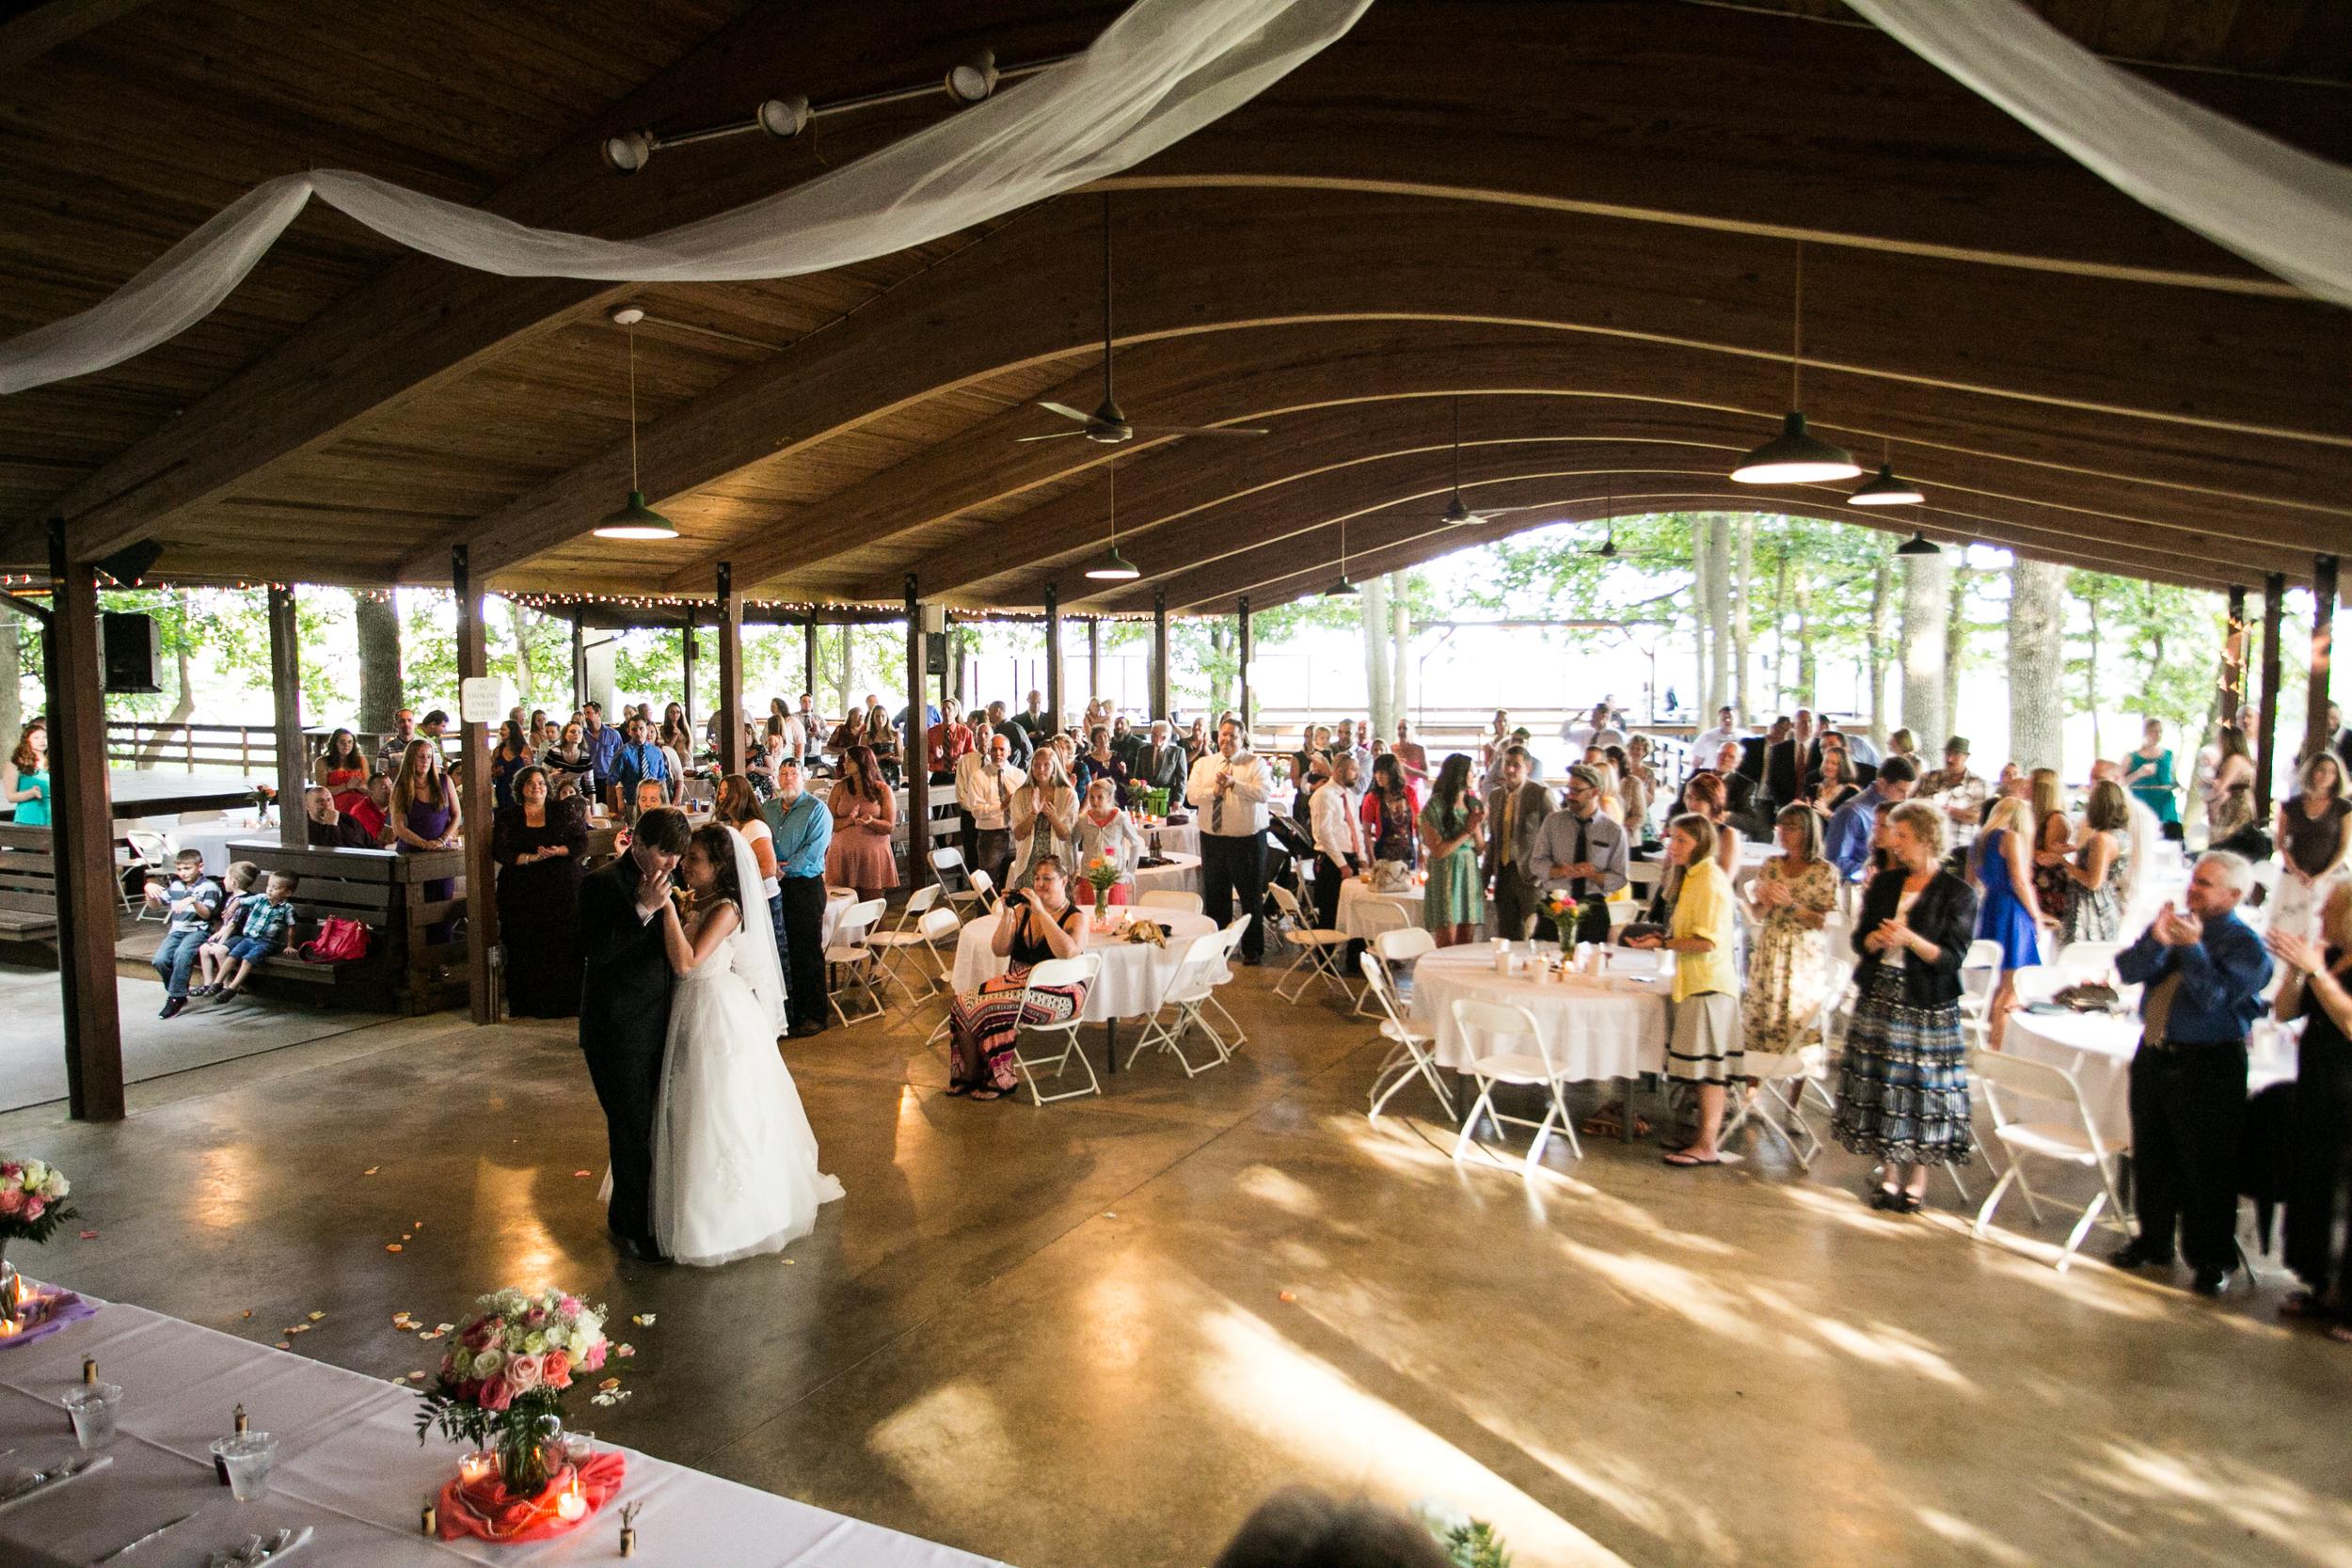 mary-brad-sizemore-wedding-naylor-vineyard-living-radiant-photography-2014-1426.jpg